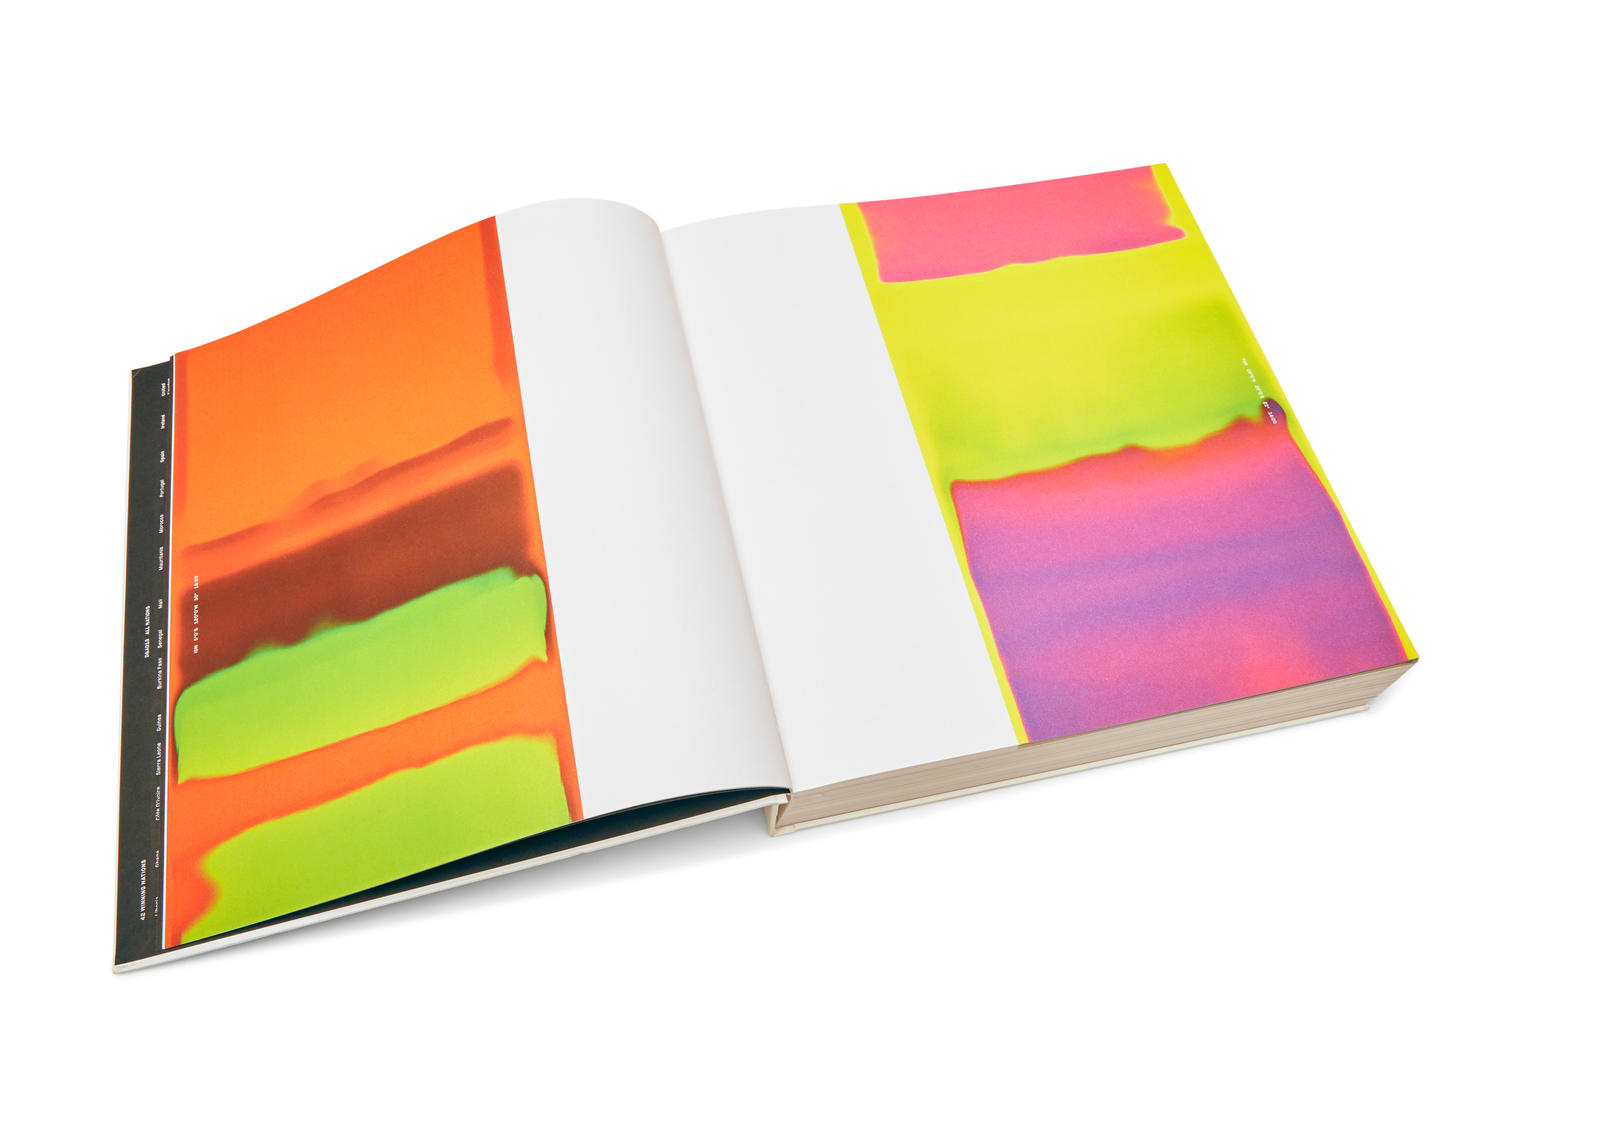 SU16_OLYMPIC_BOOKS_0102_AW1